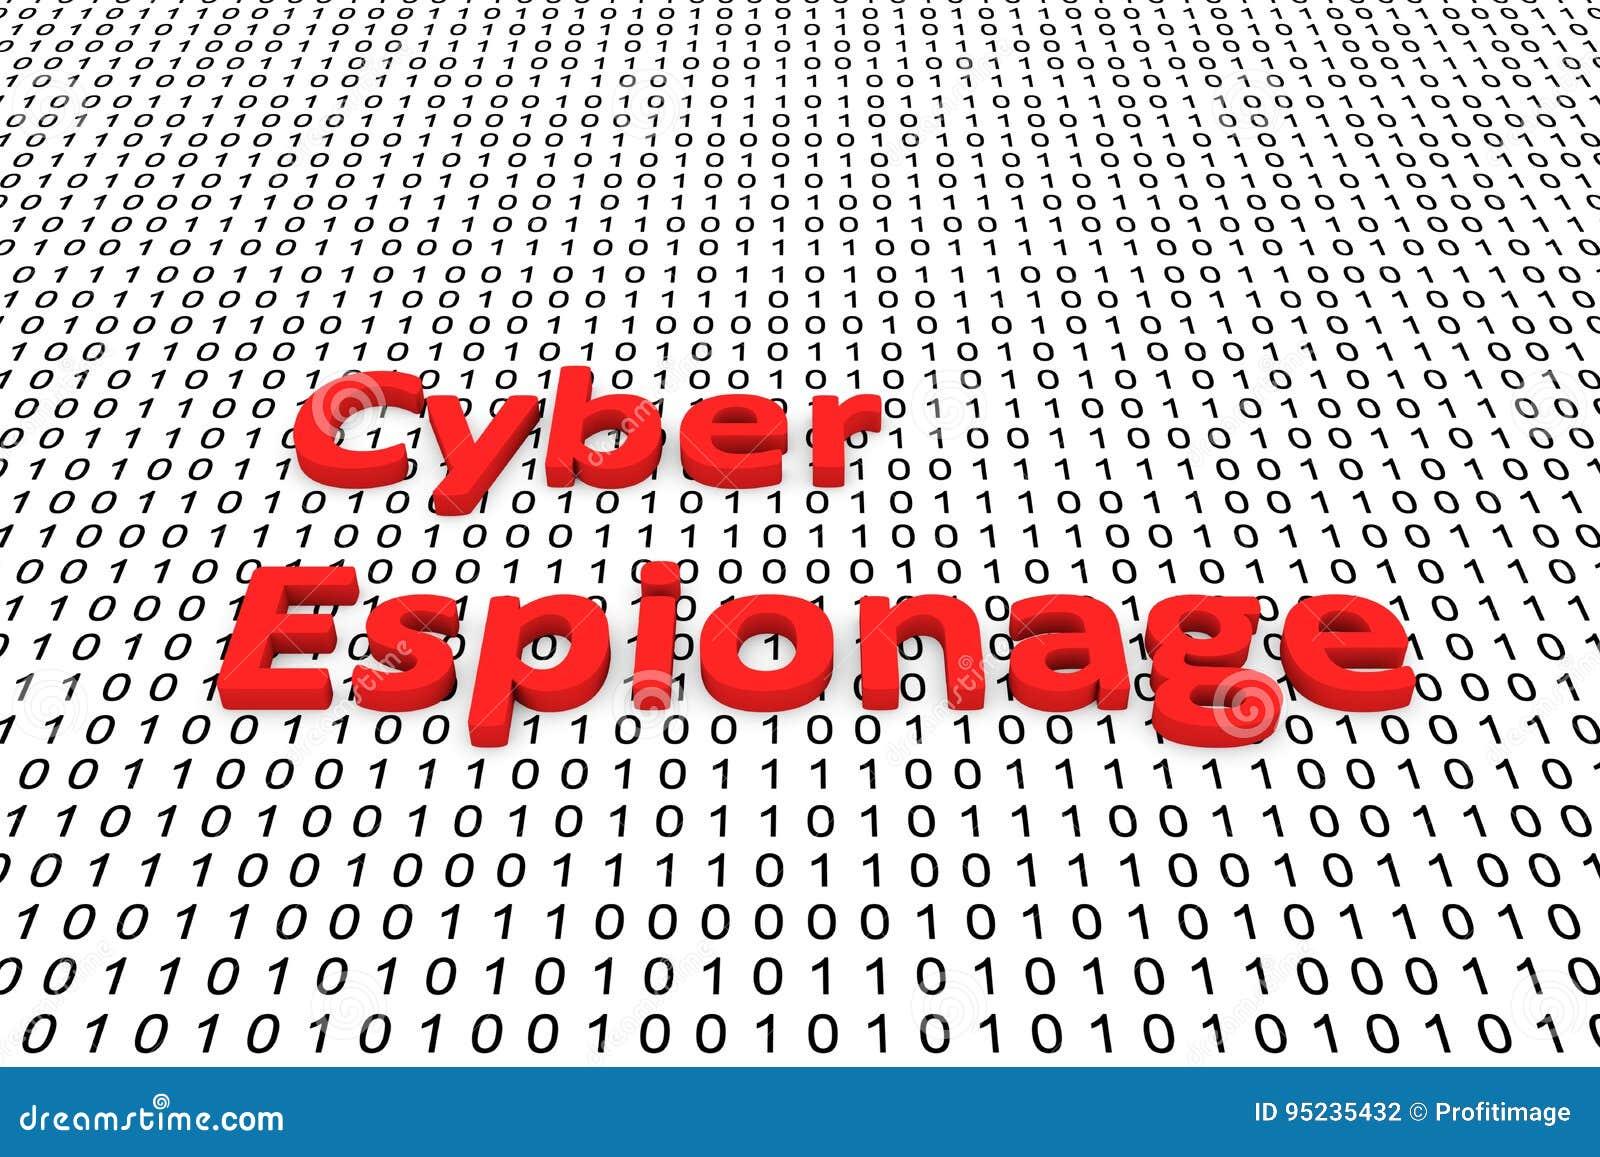 Espionnage de Cyber